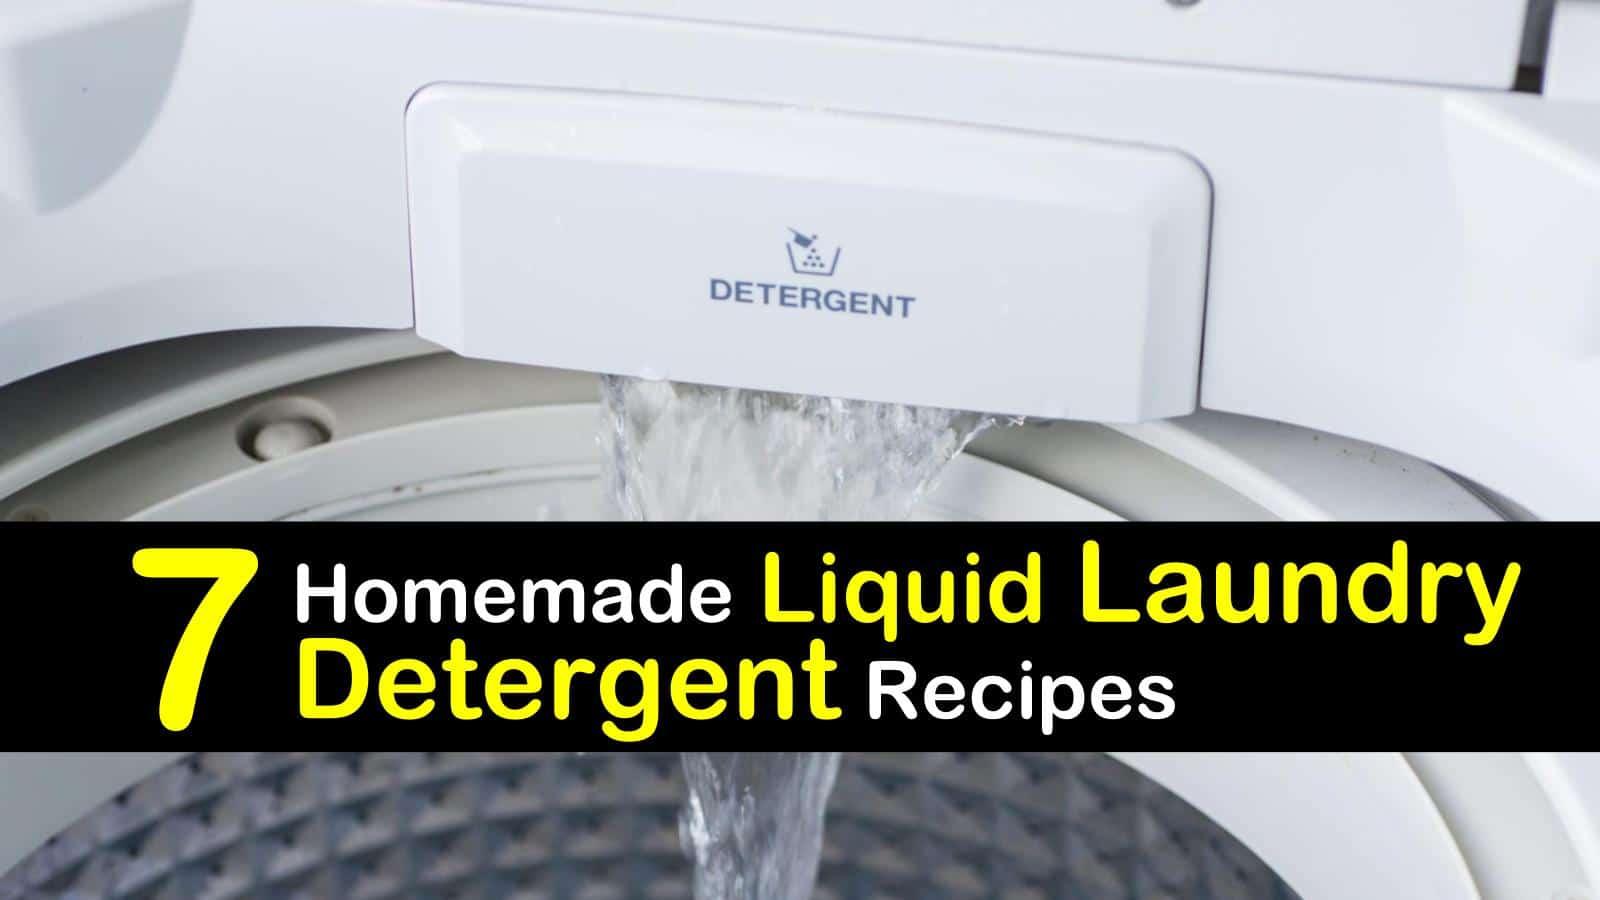 homemade liquid laundry detergent titleimg1